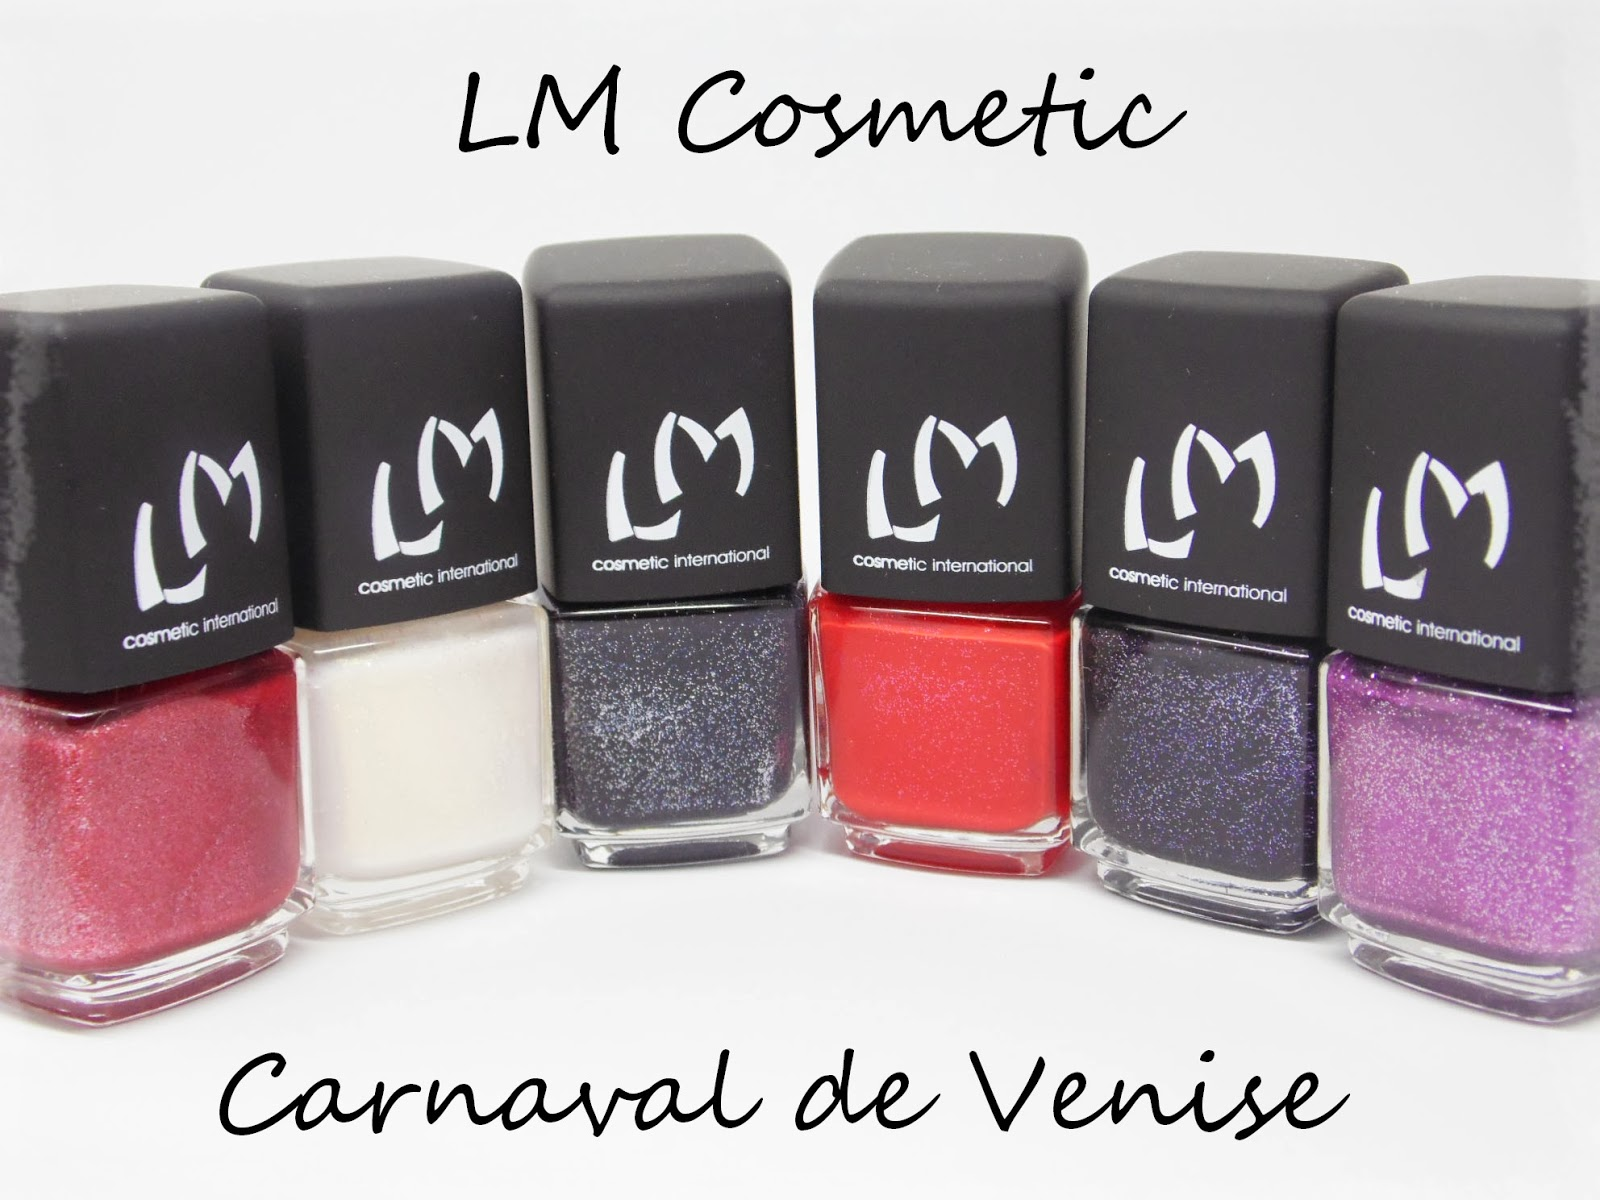 LM Cosmetic Collection Carnaval de Venis